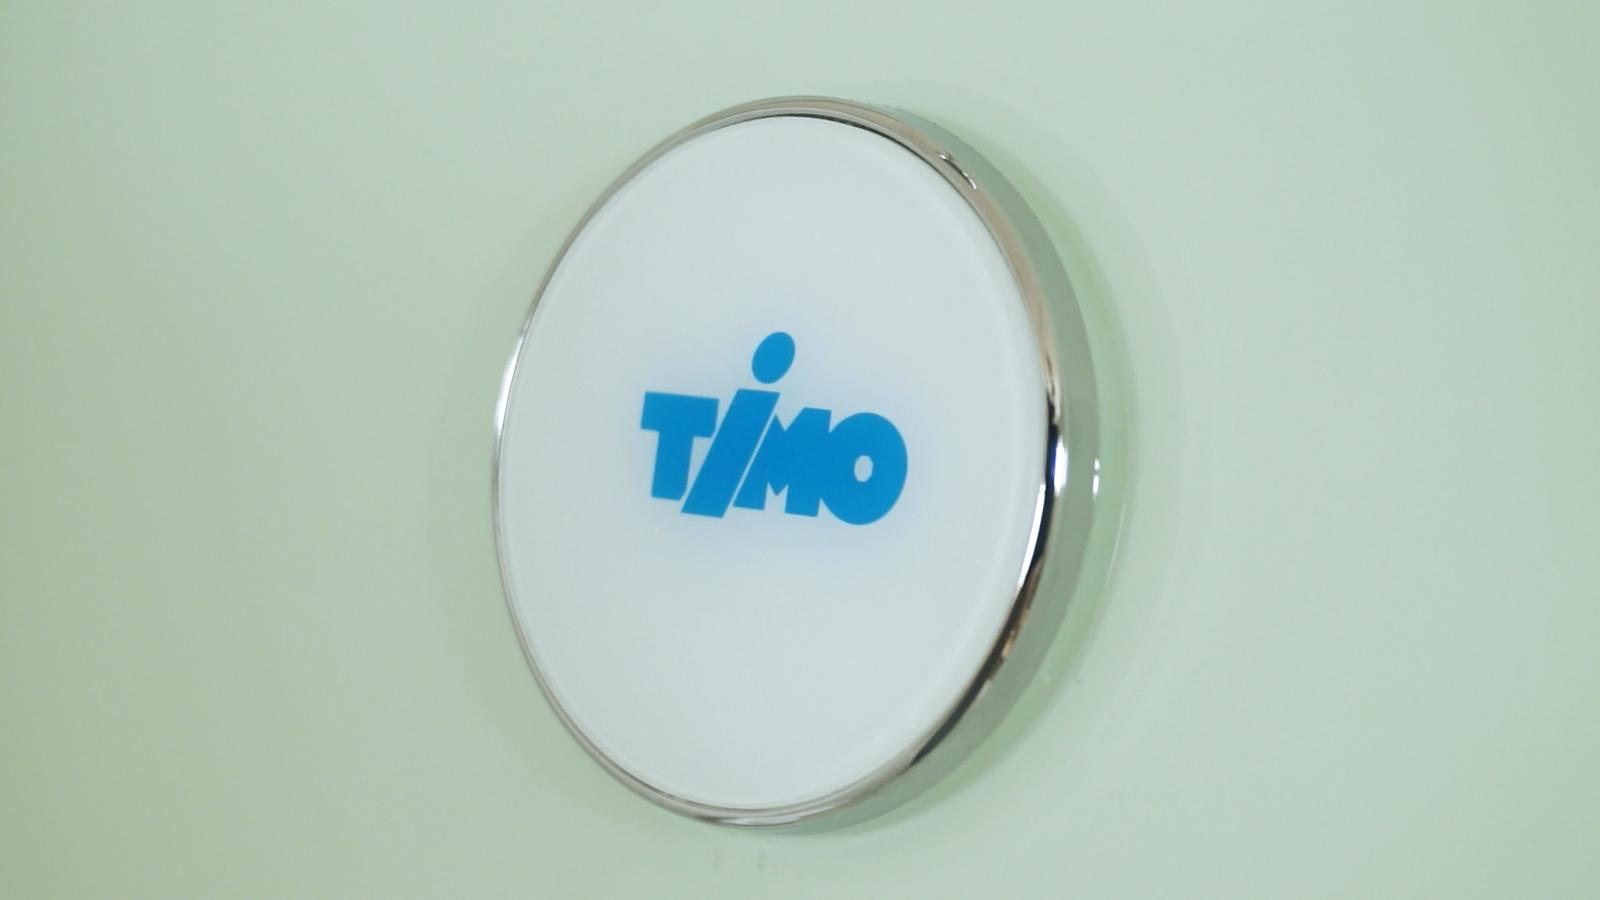 Душевая кабина Timo ILMA 909